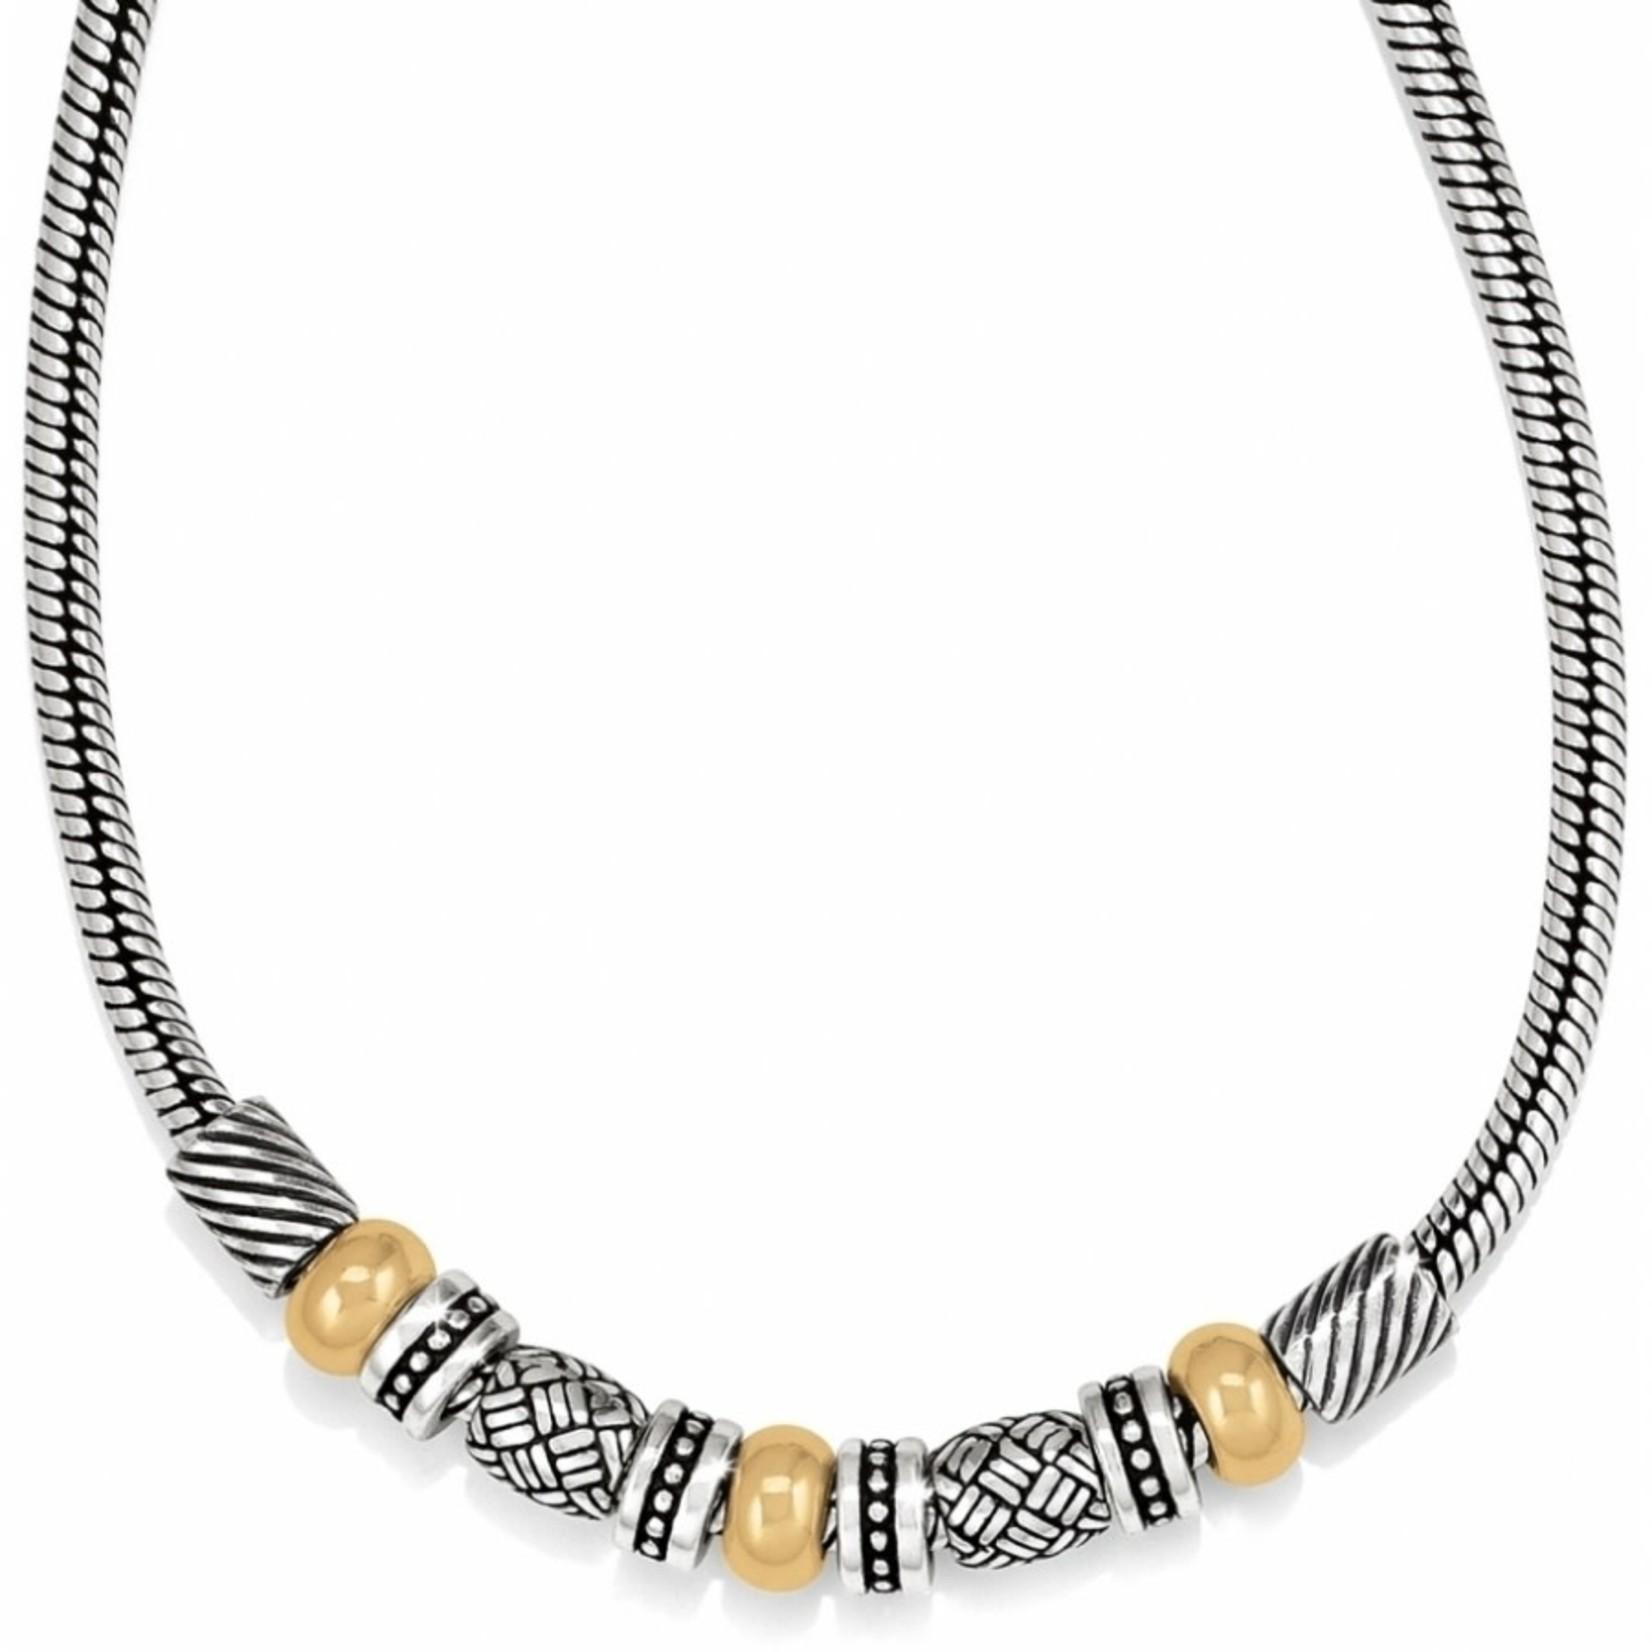 Brighton Travis Beads Necklace